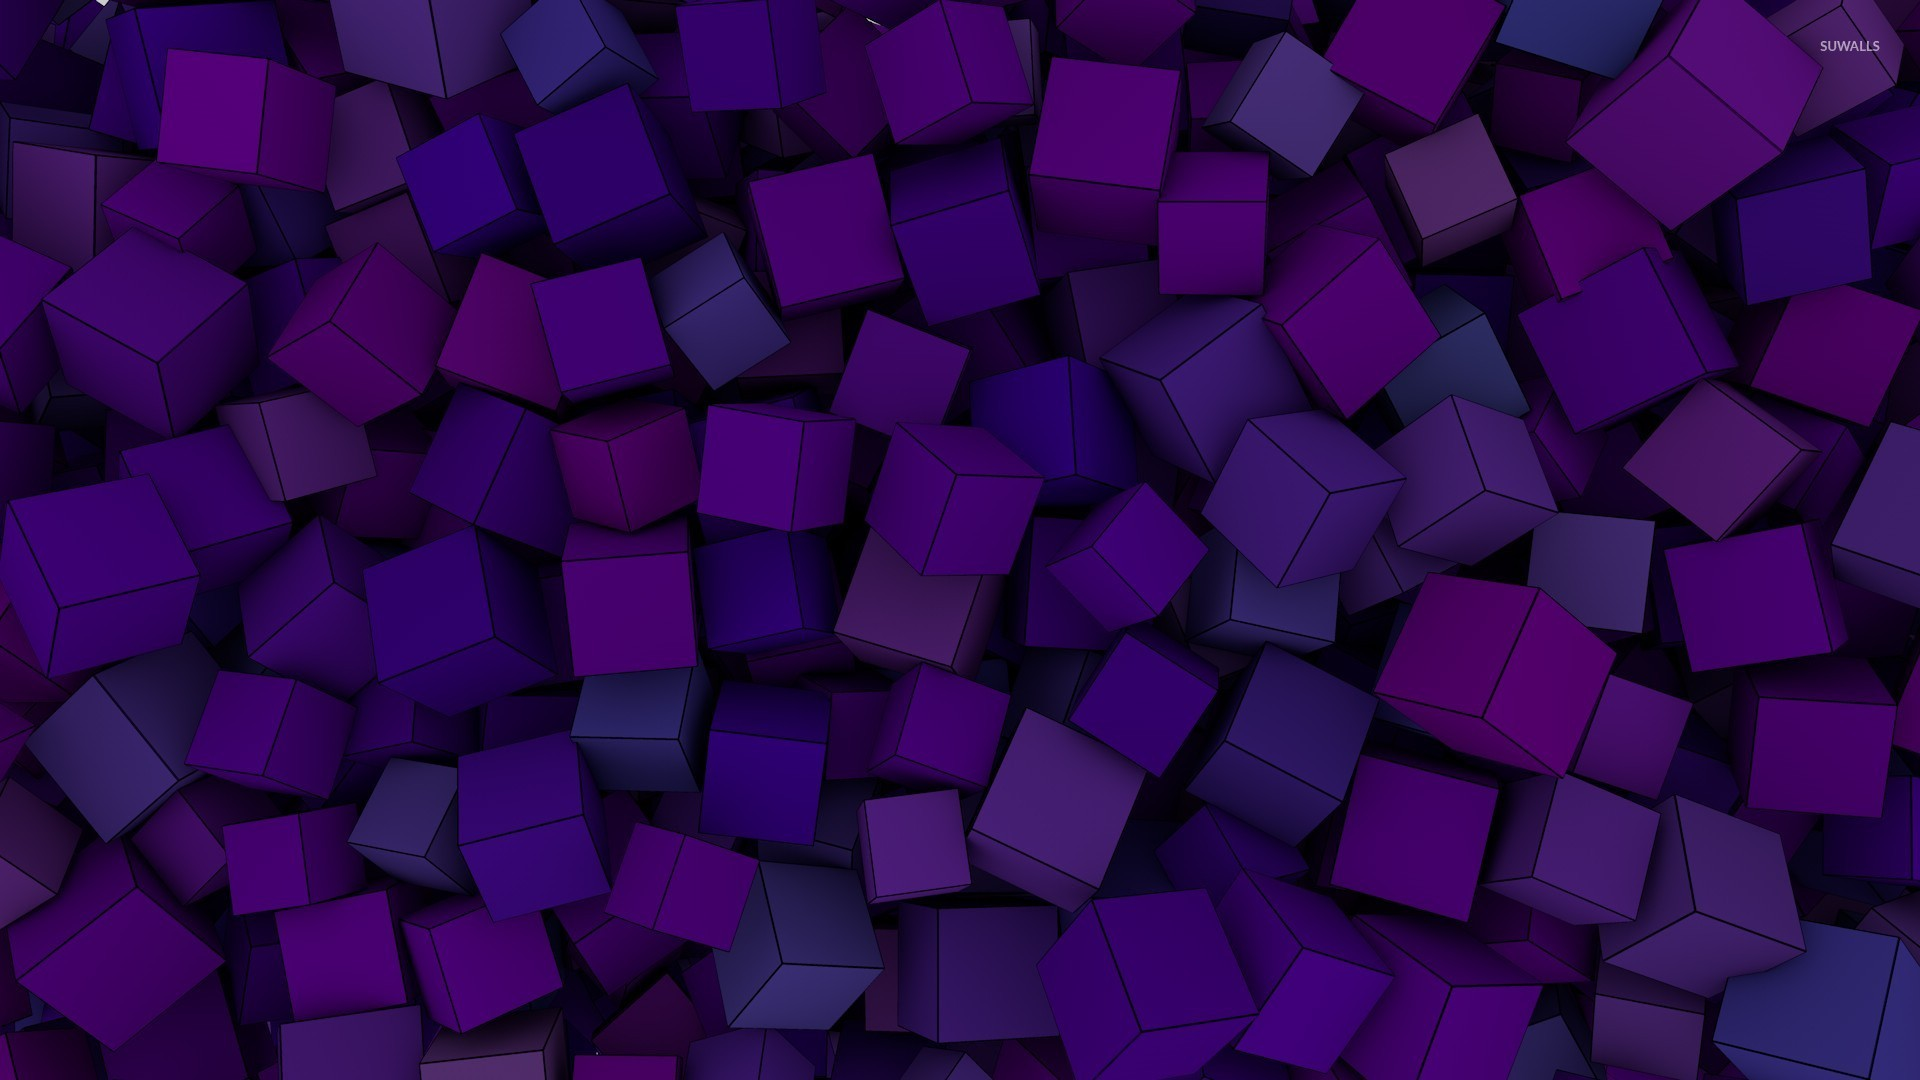 Кубики  № 2315815 без смс